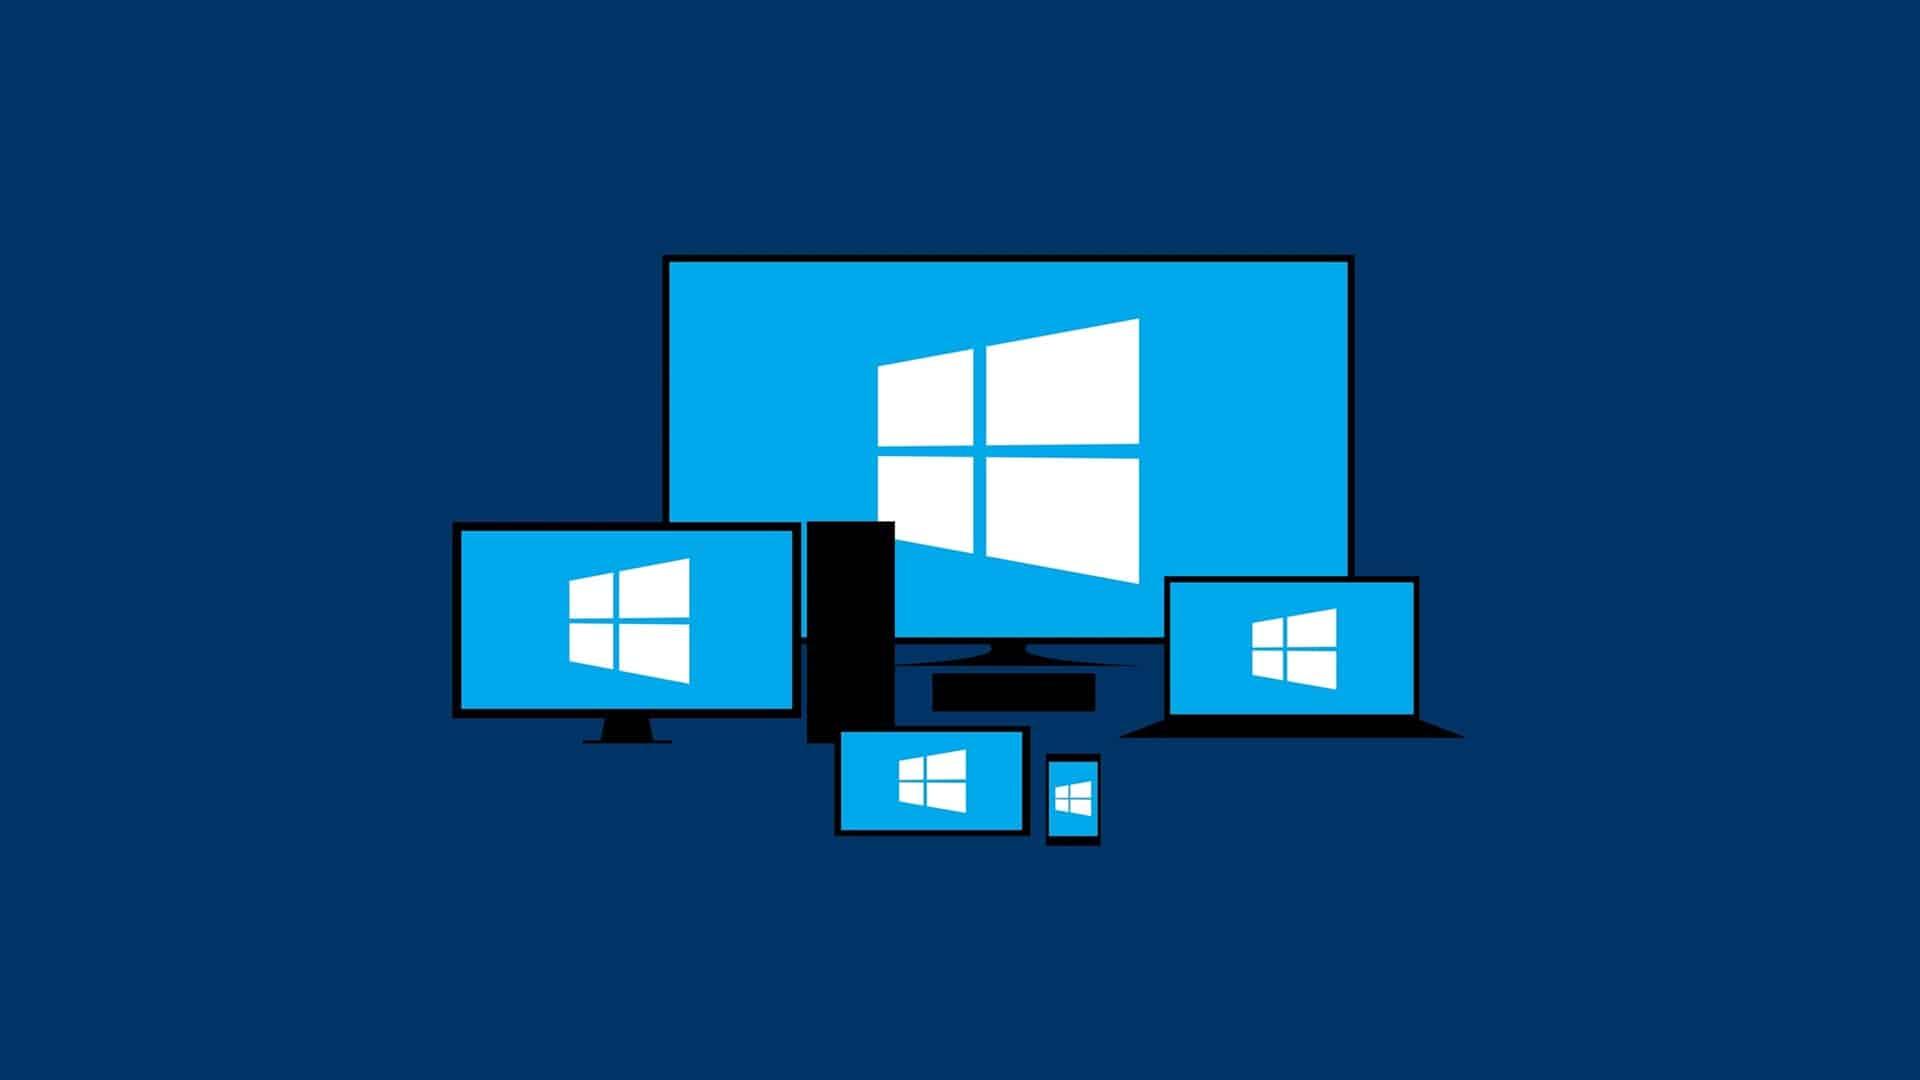 Windows uzamknutá obrazovka